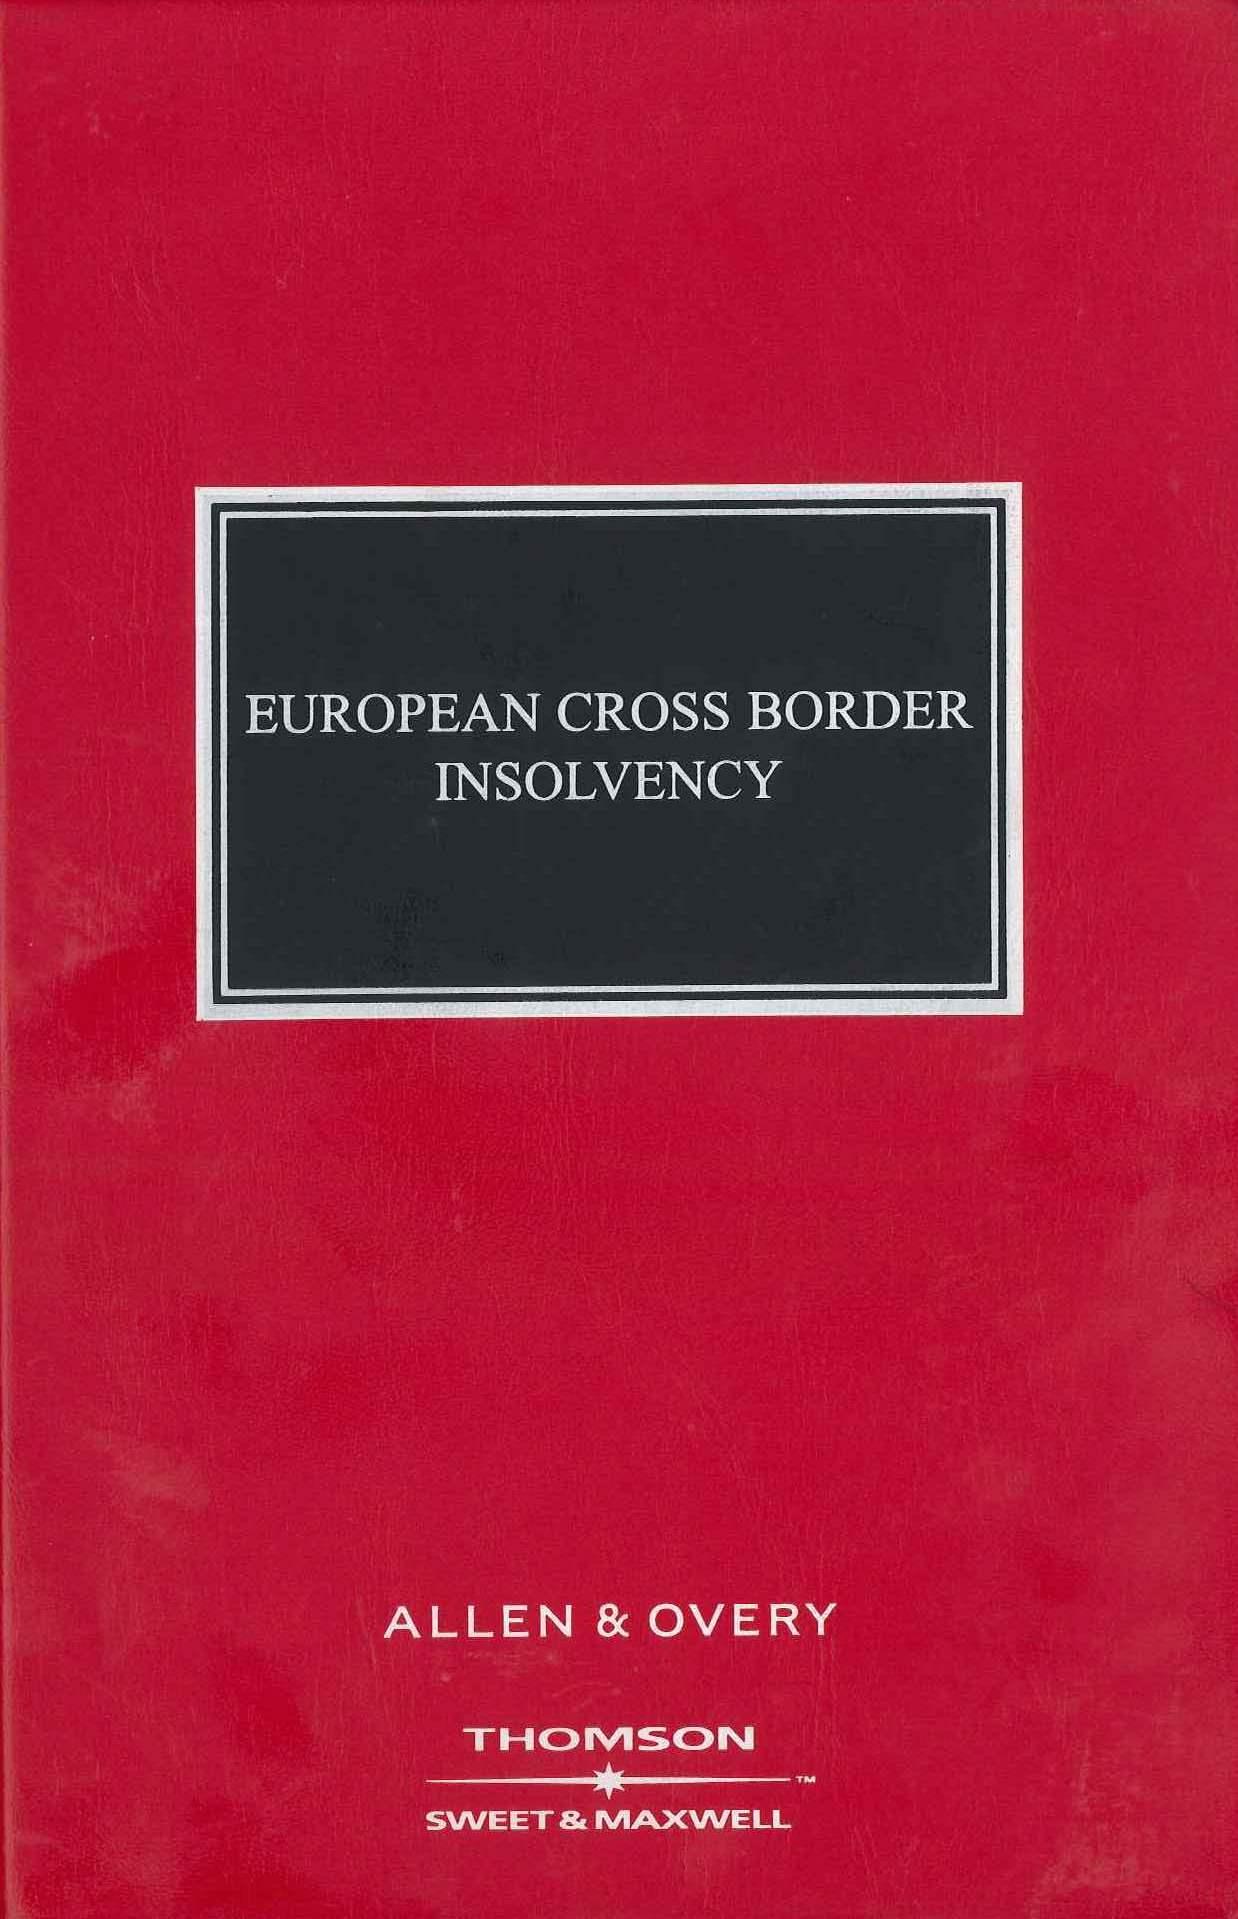 european-cross-border-insolvency-proceedings-bulgaria-2007